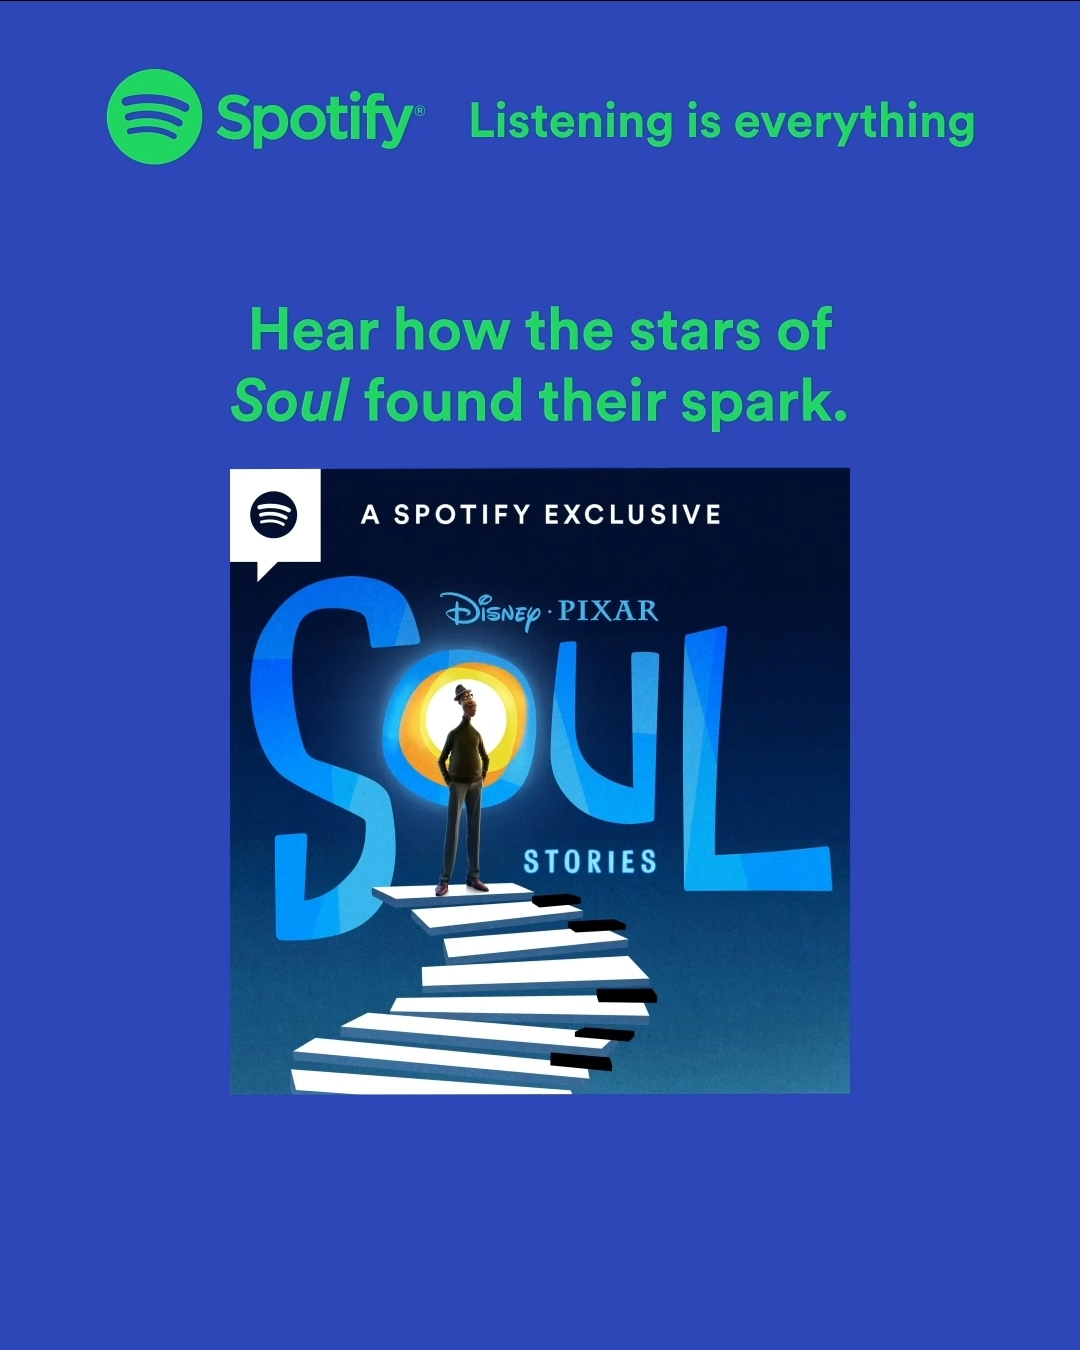 Gershoni CS Spotify Soul Social Ad Typographic 1080x1350 Video Poster 030421